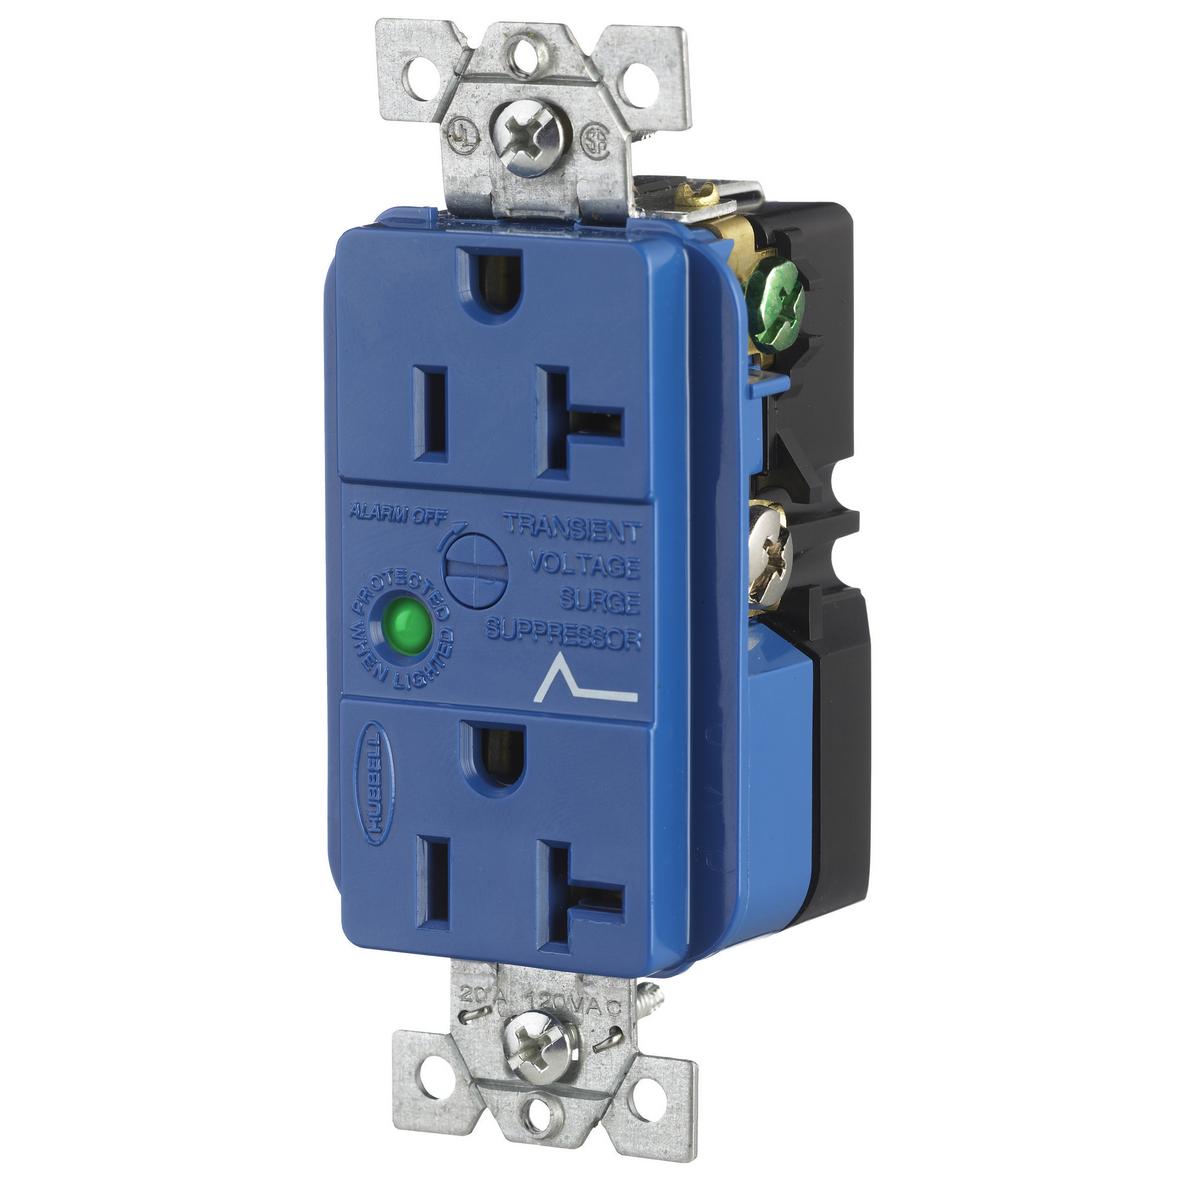 Hubbell HBL5360SA 20 Amp 125 Volt 2-Pole 3-Wire NEMA 5-20R Blue Duplex Surge Suppression Receptacle